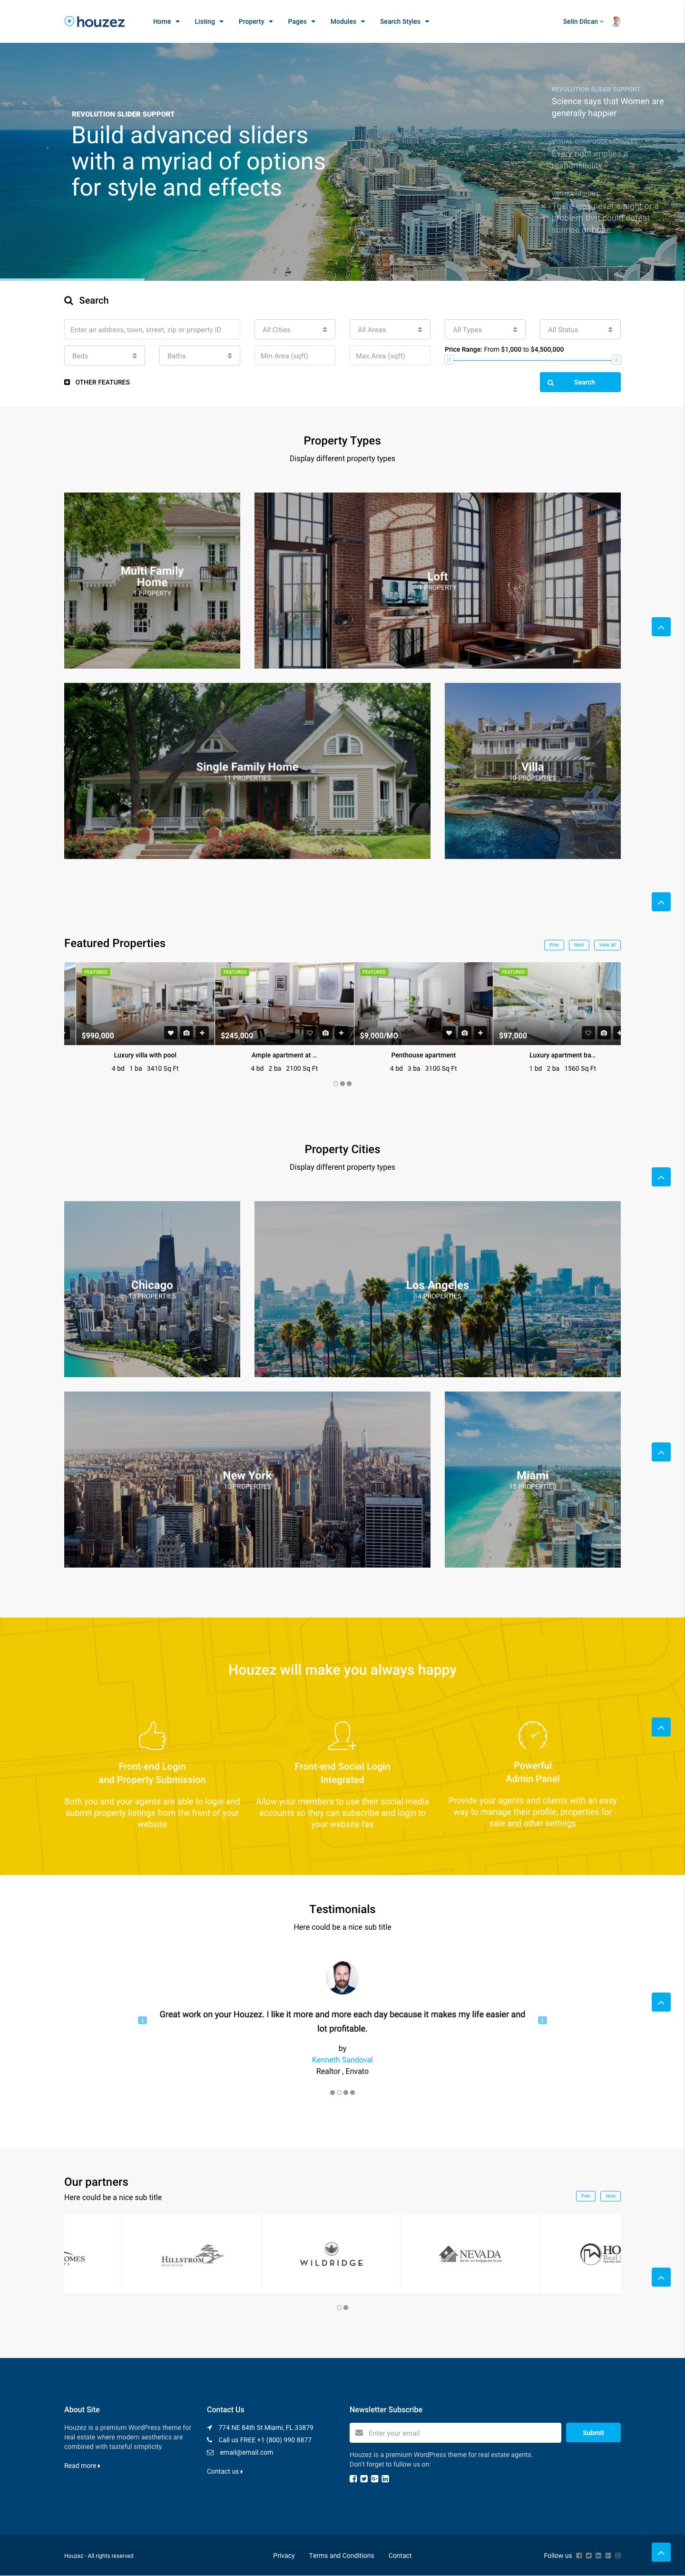 Houzez - Real Estate WordPress Theme